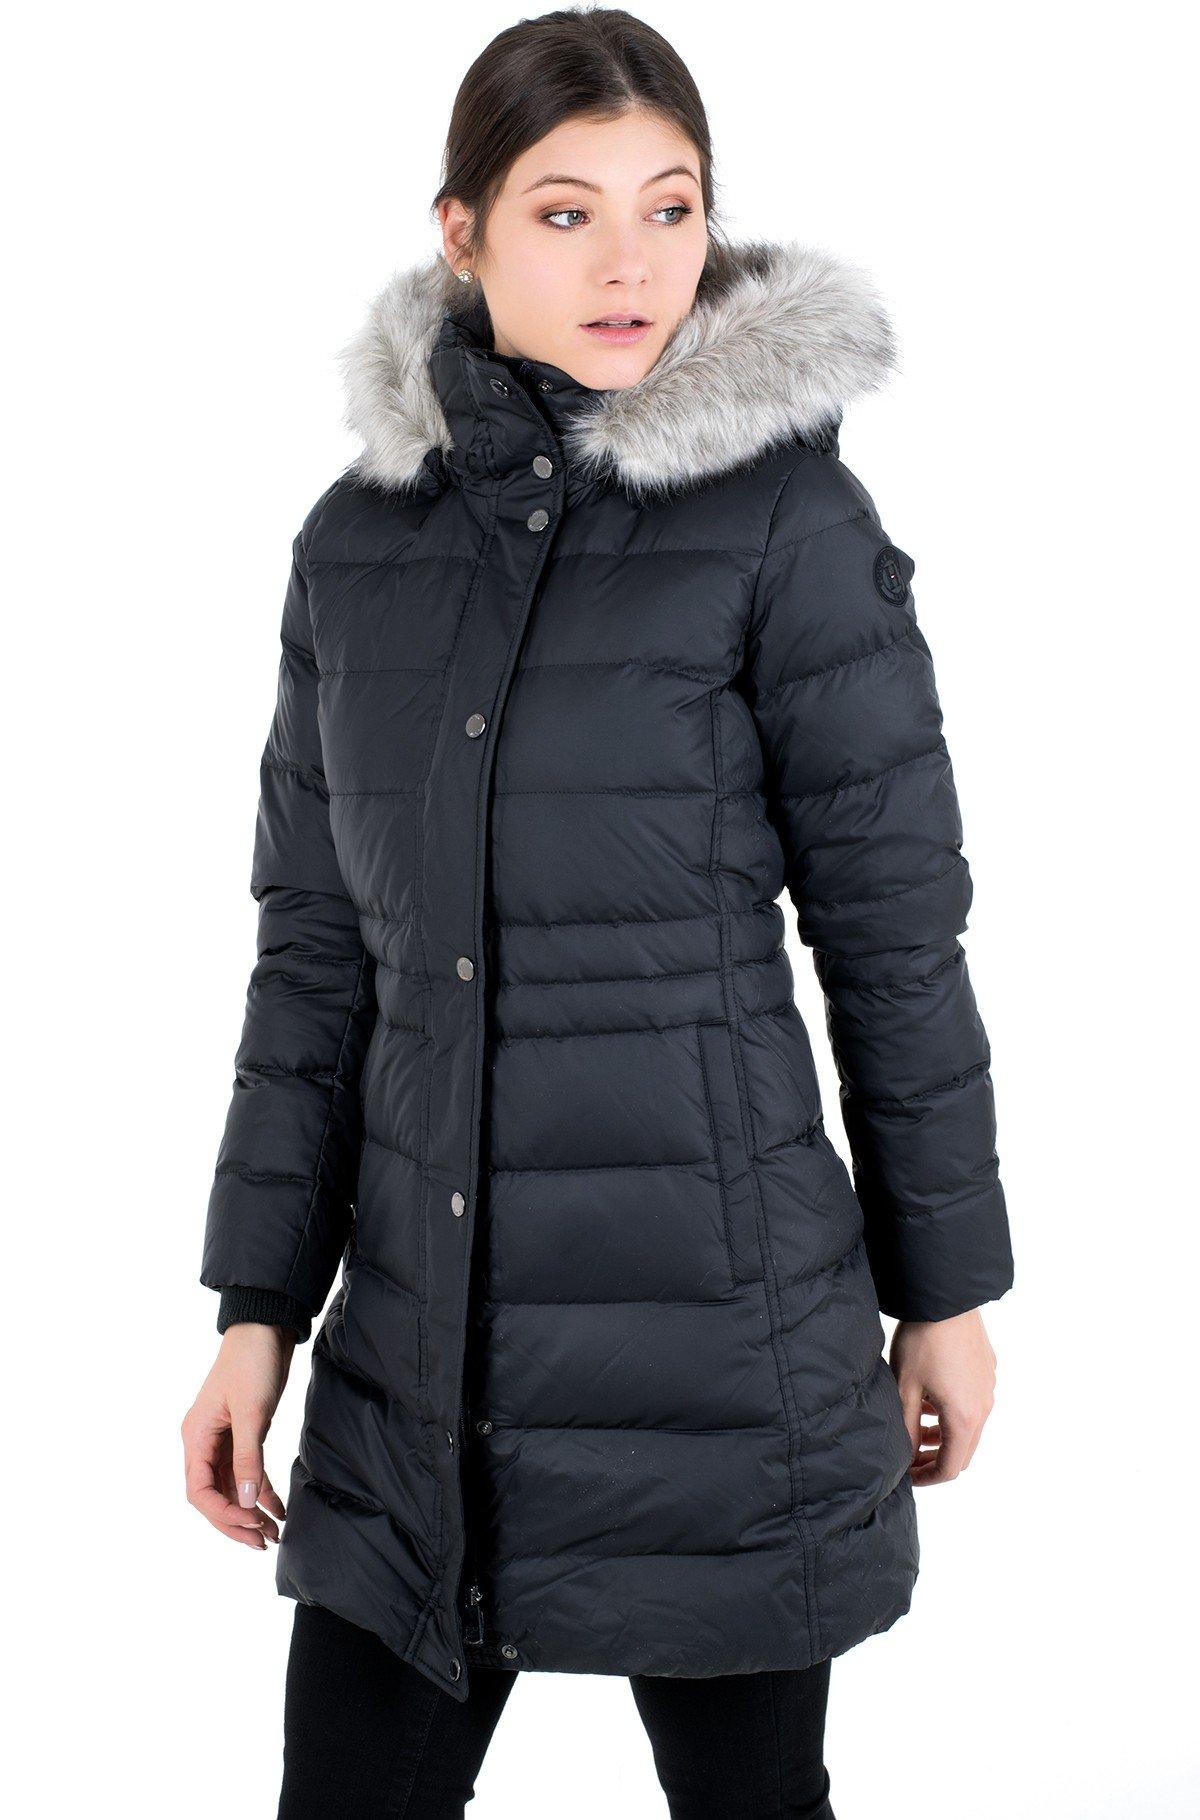 Pea coat NEW TYRA DOWN COAT-full-1